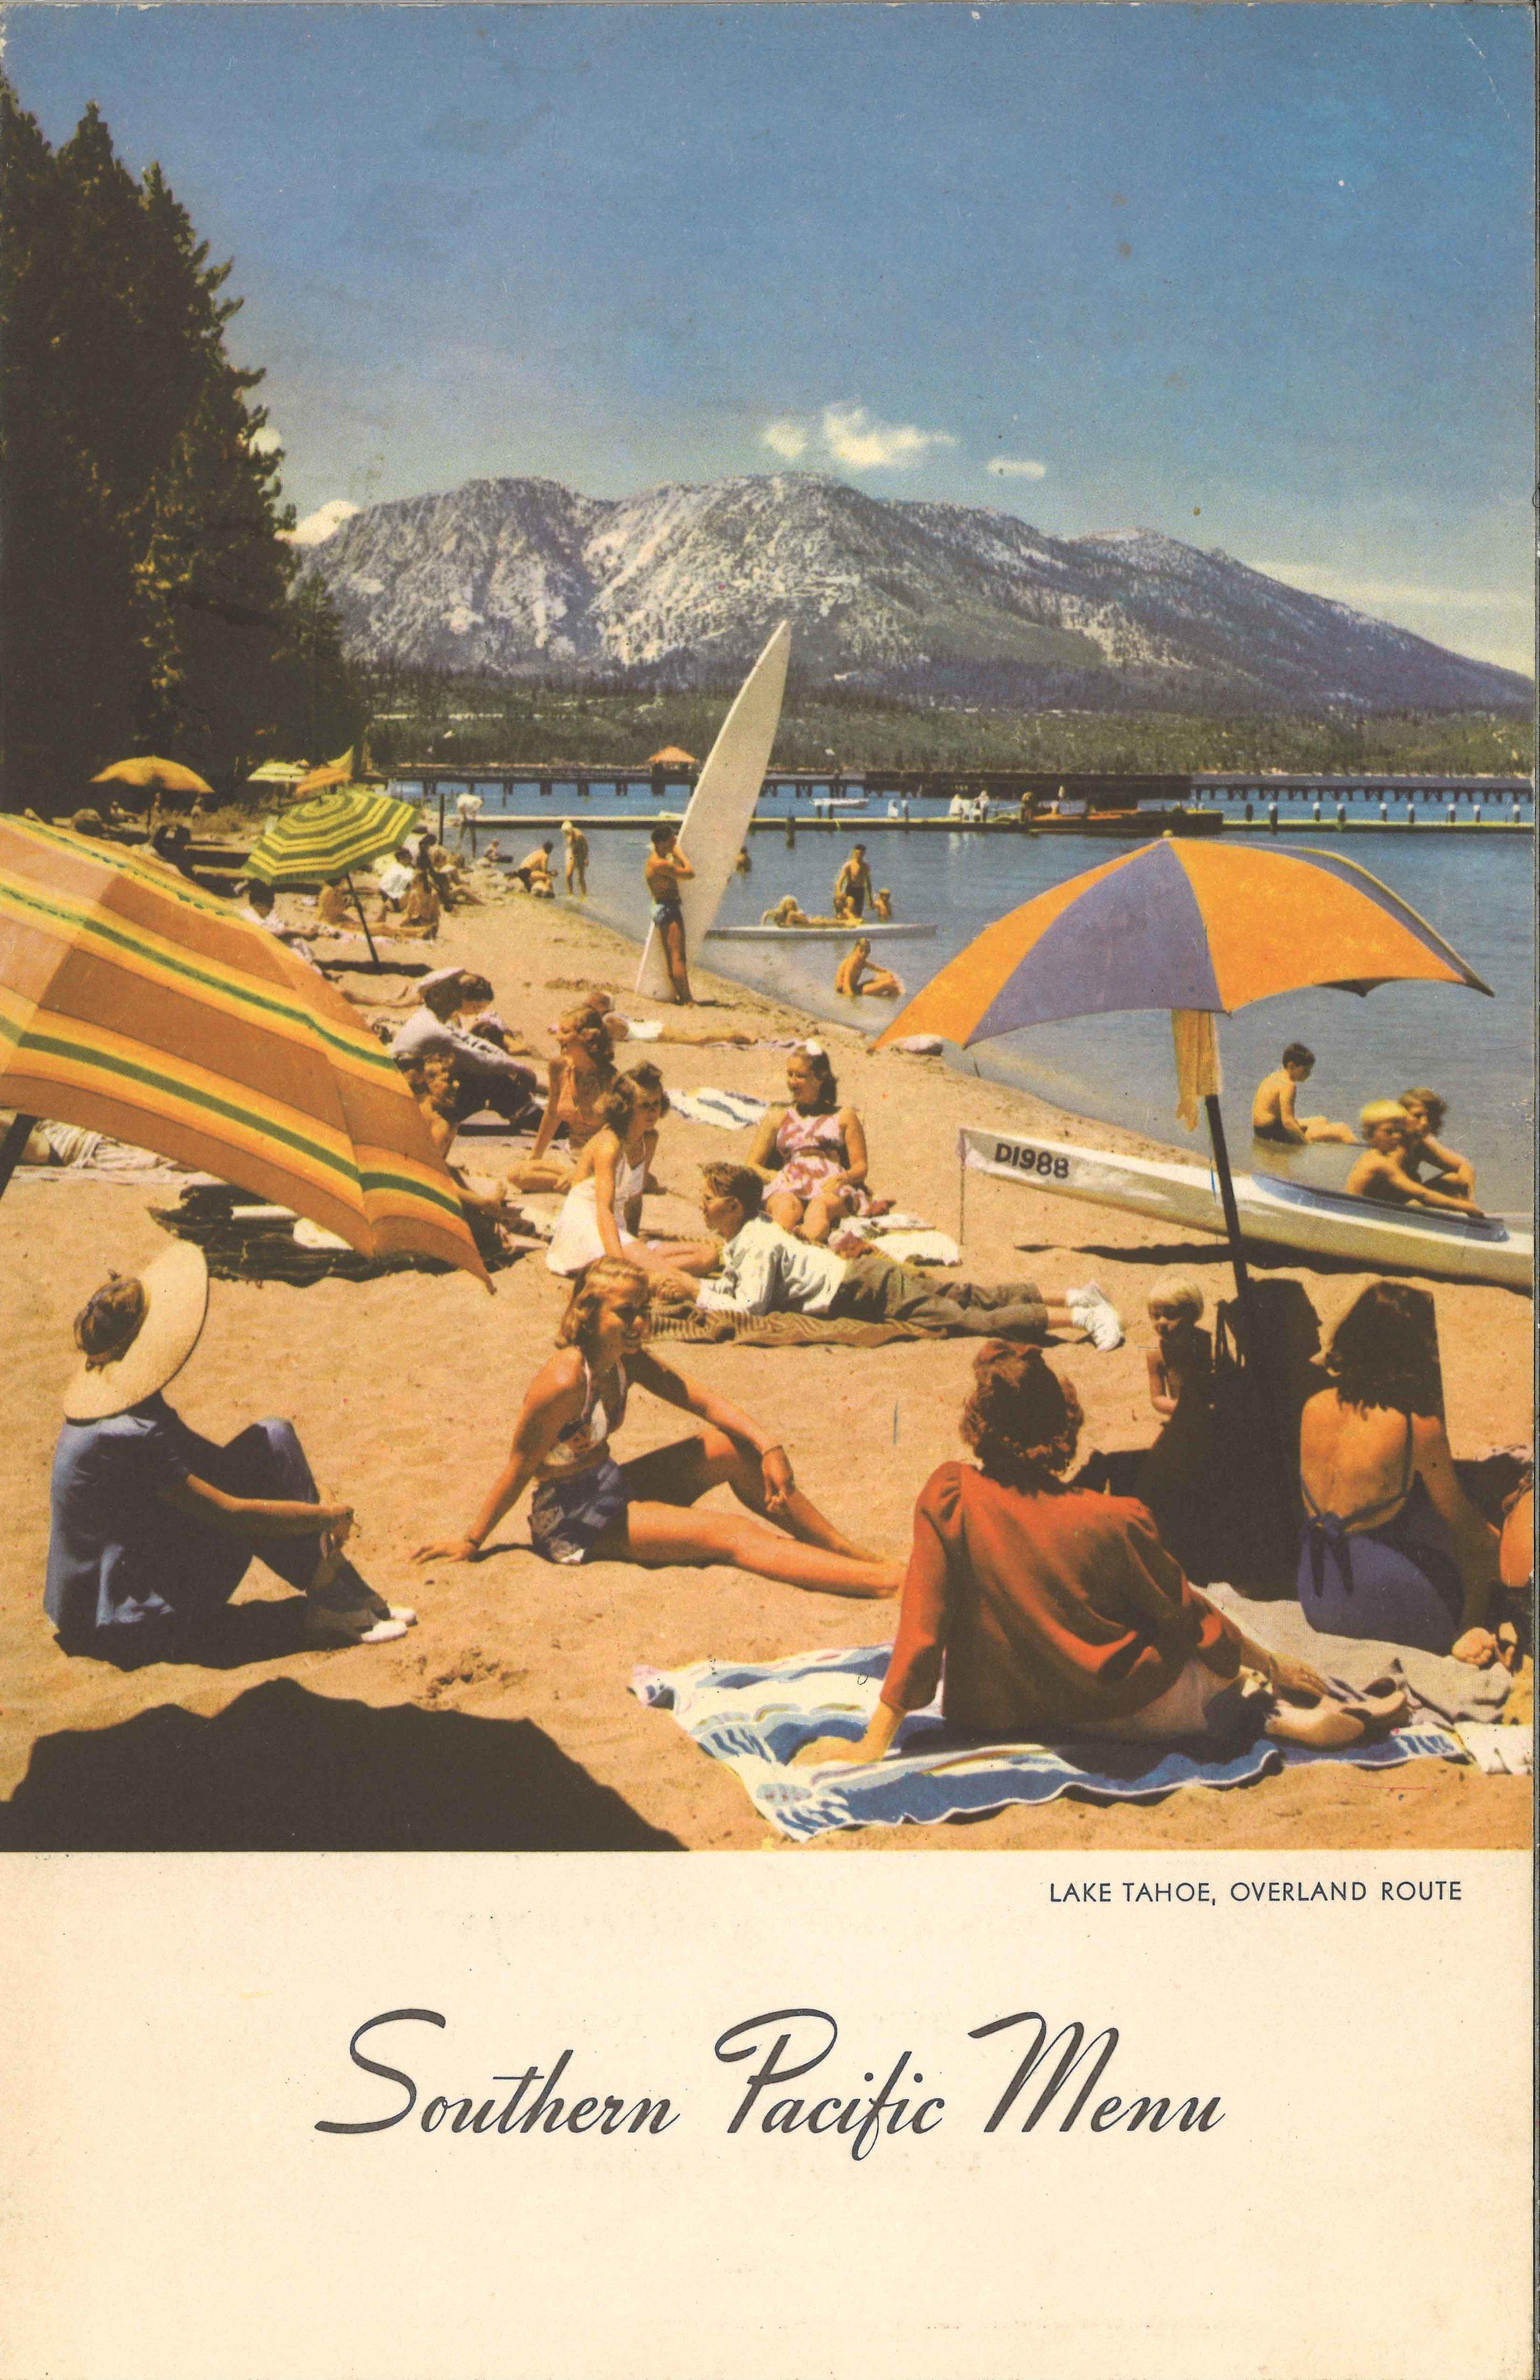 SP Lake Tahoe Beach Scene 1 small.jpg